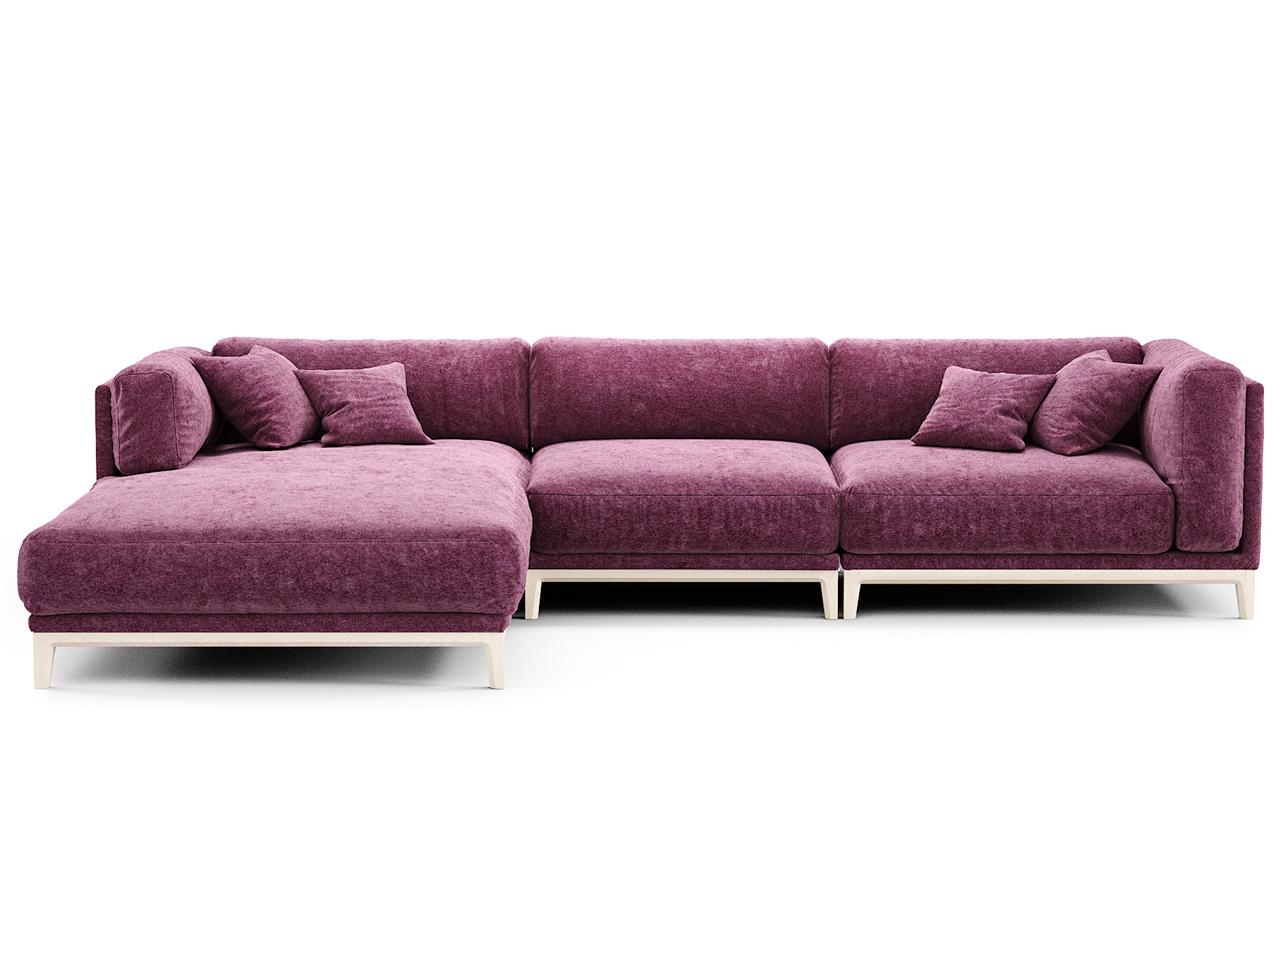 The idea диван case фиолетовый 108257/9